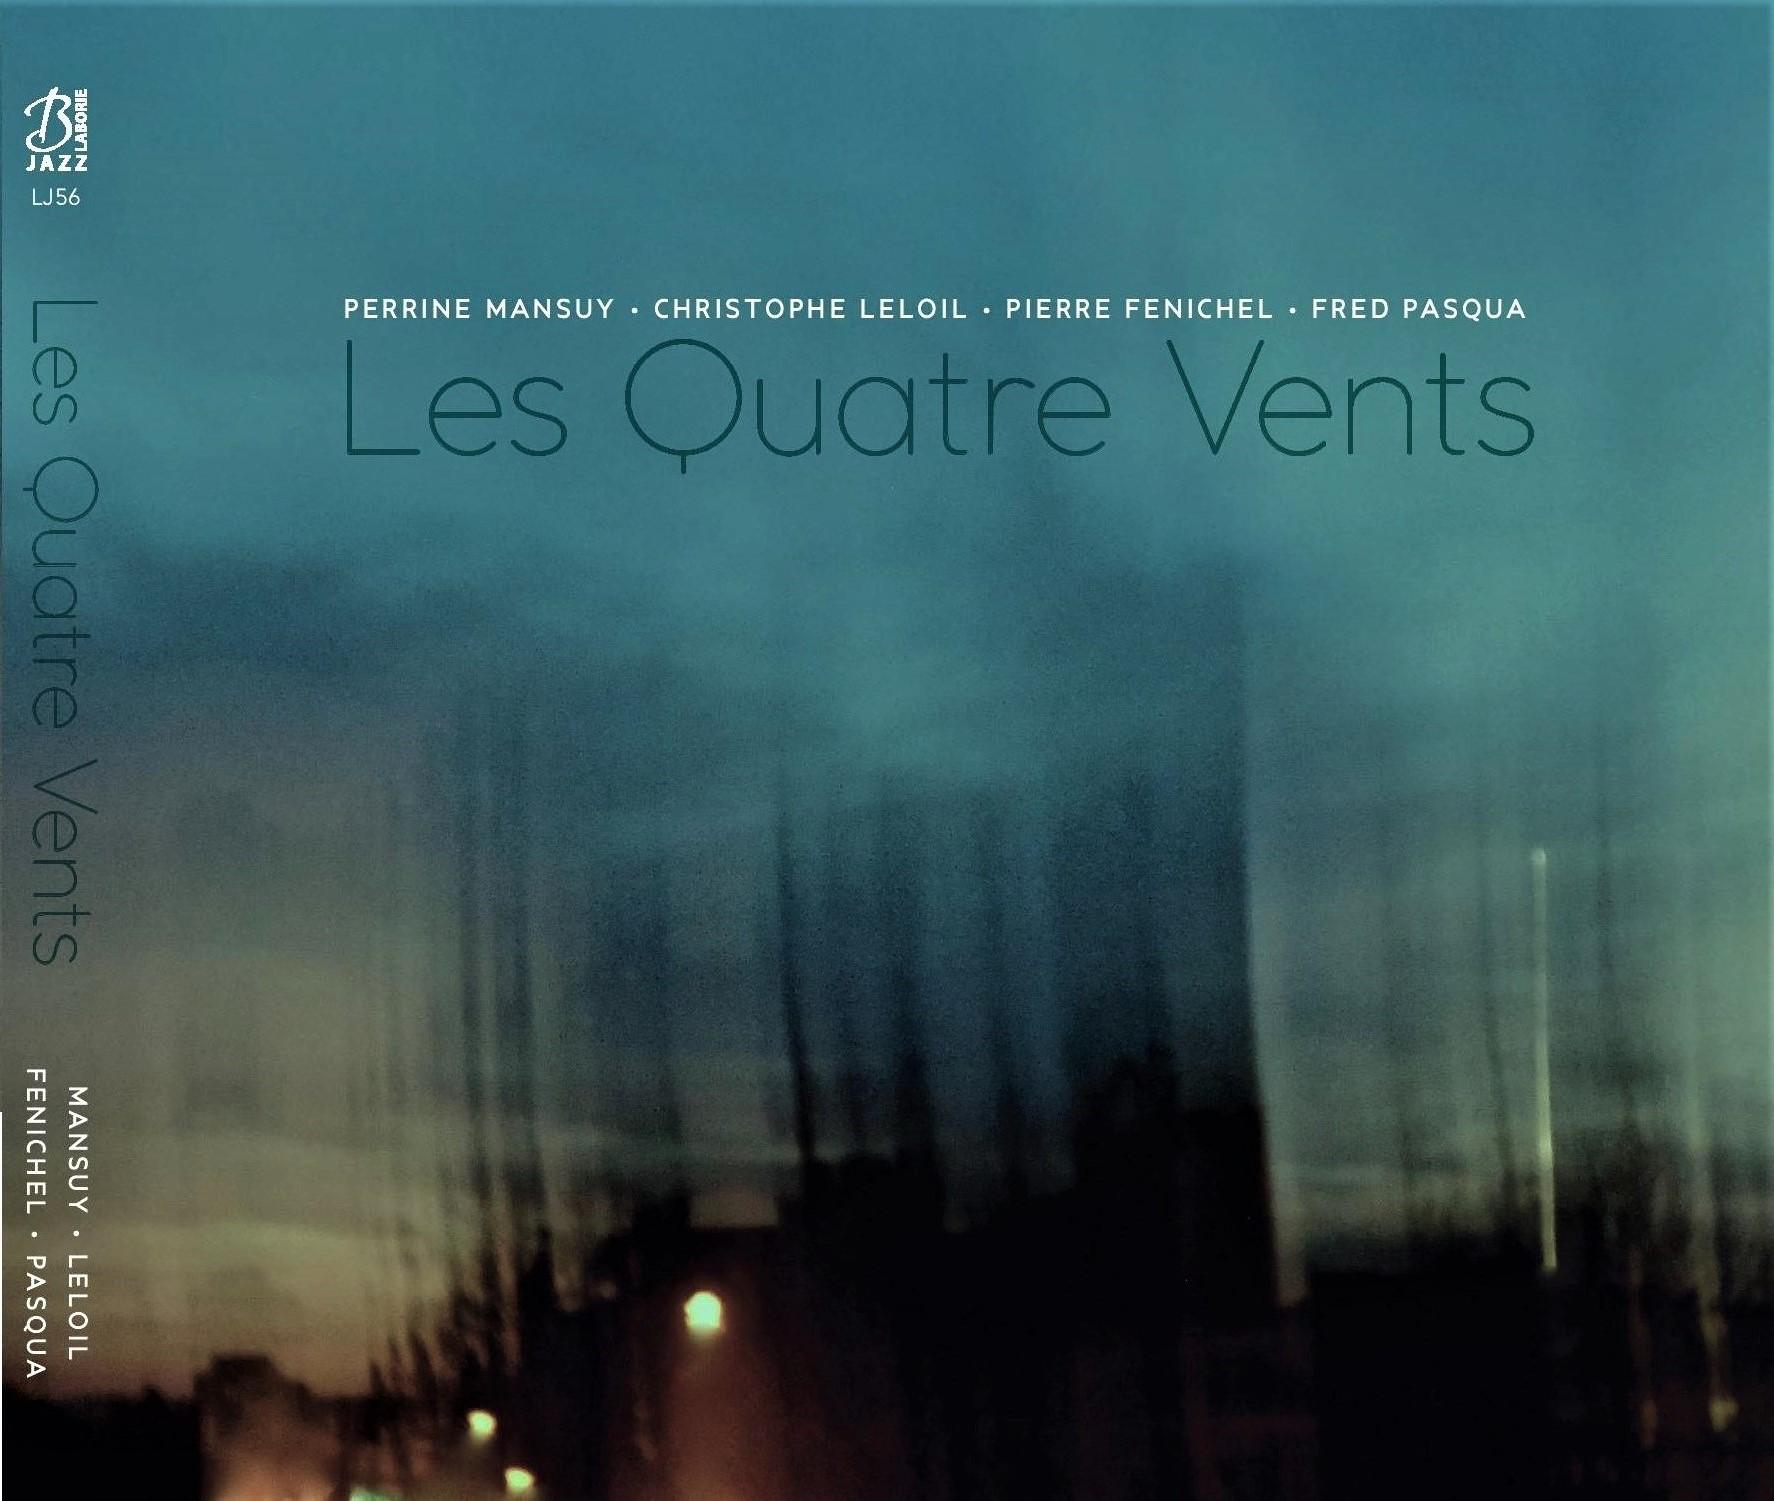 LJ56 - Perrine Mansuy - Les Quatre Vents - Digipak - HD-page-001 (6)